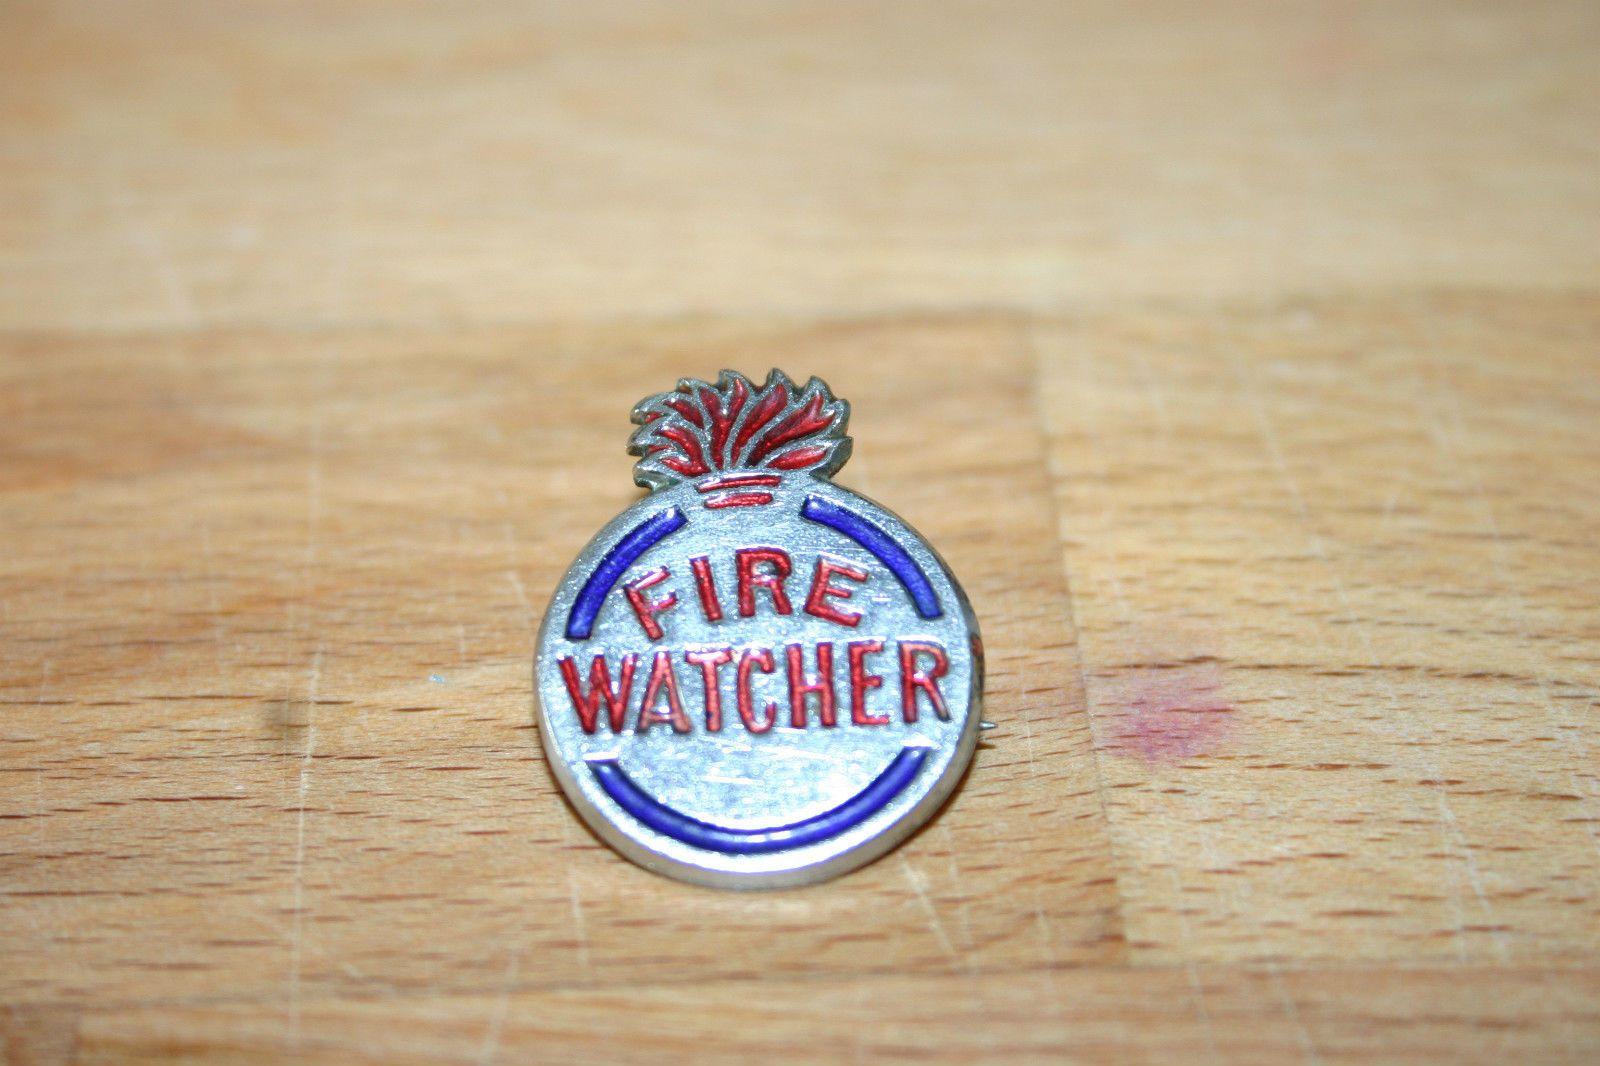 Toy box metal decor wall art shop play children store a180 ebay - Cww2 Vintage Fire Watcher Home Front Enamel Pin Badge Ebay